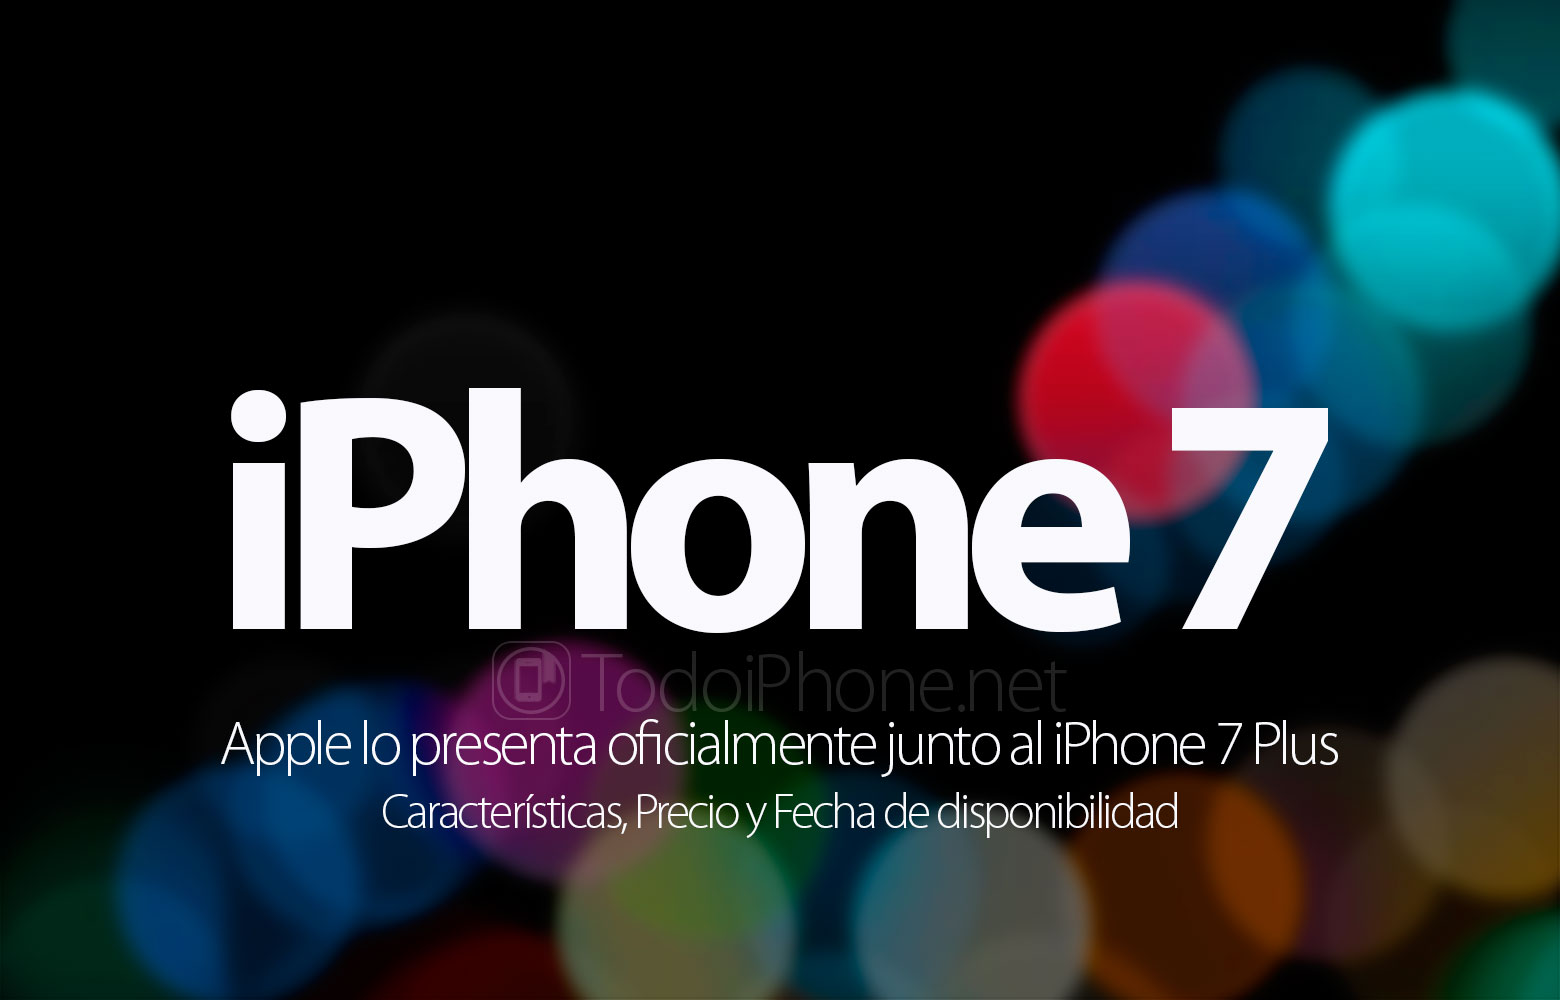 iphone-7-apple-presenta-oficial